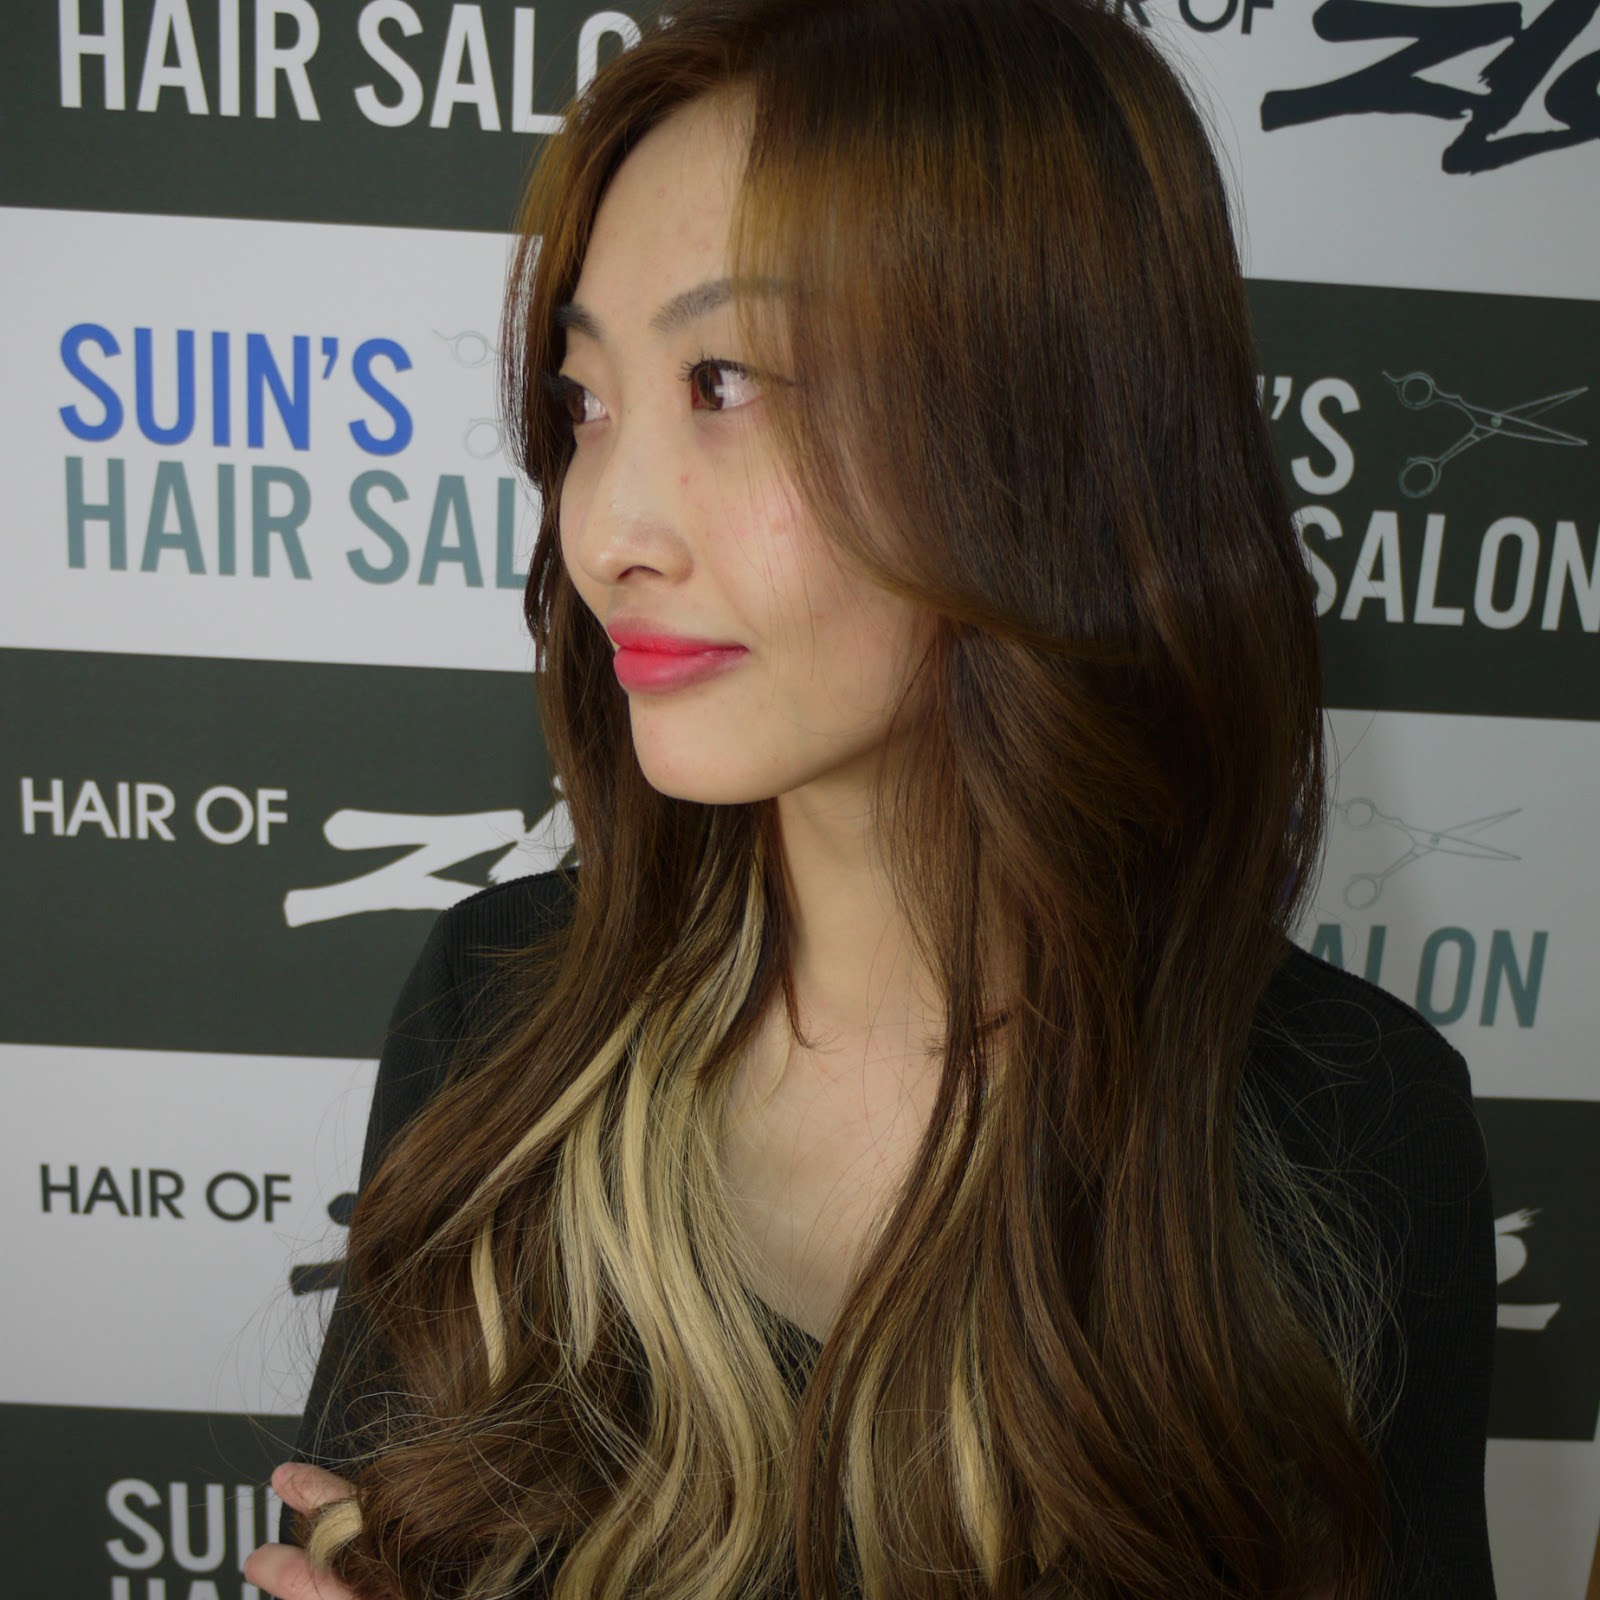 Hair Extension In Korean Hair Salon Suinstyle Hairspa